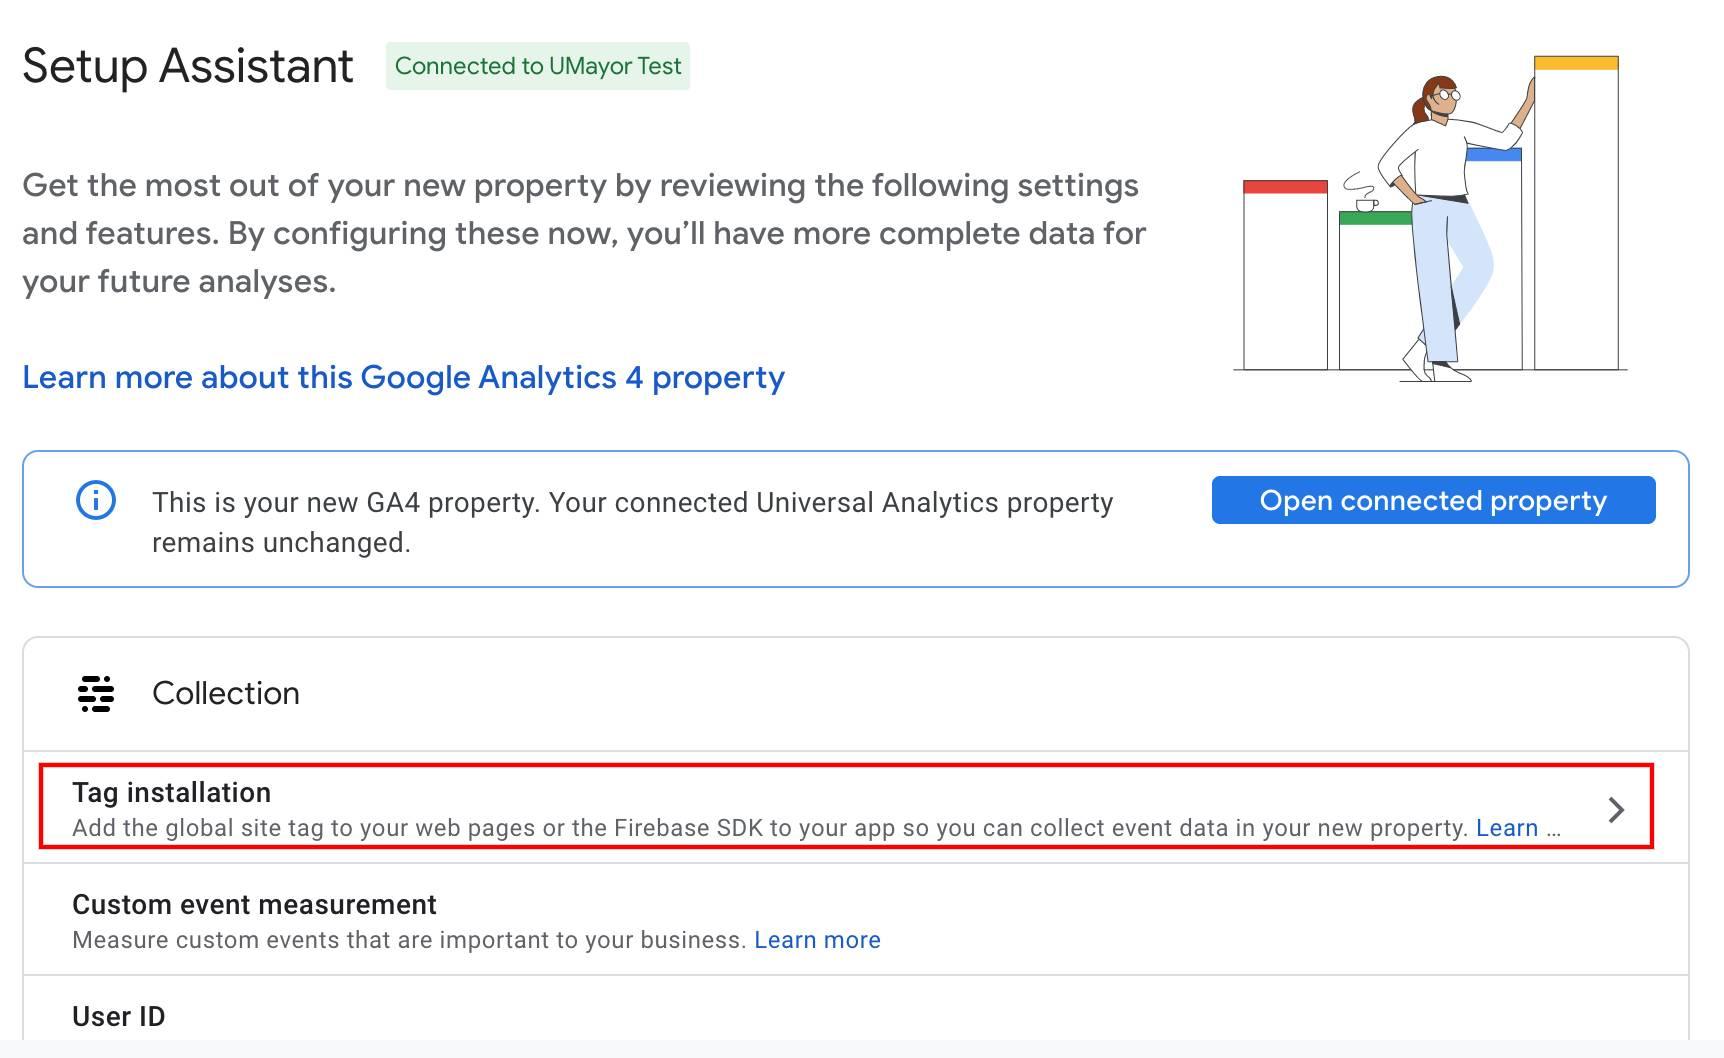 google analytics 4 setup assistant select tag installation